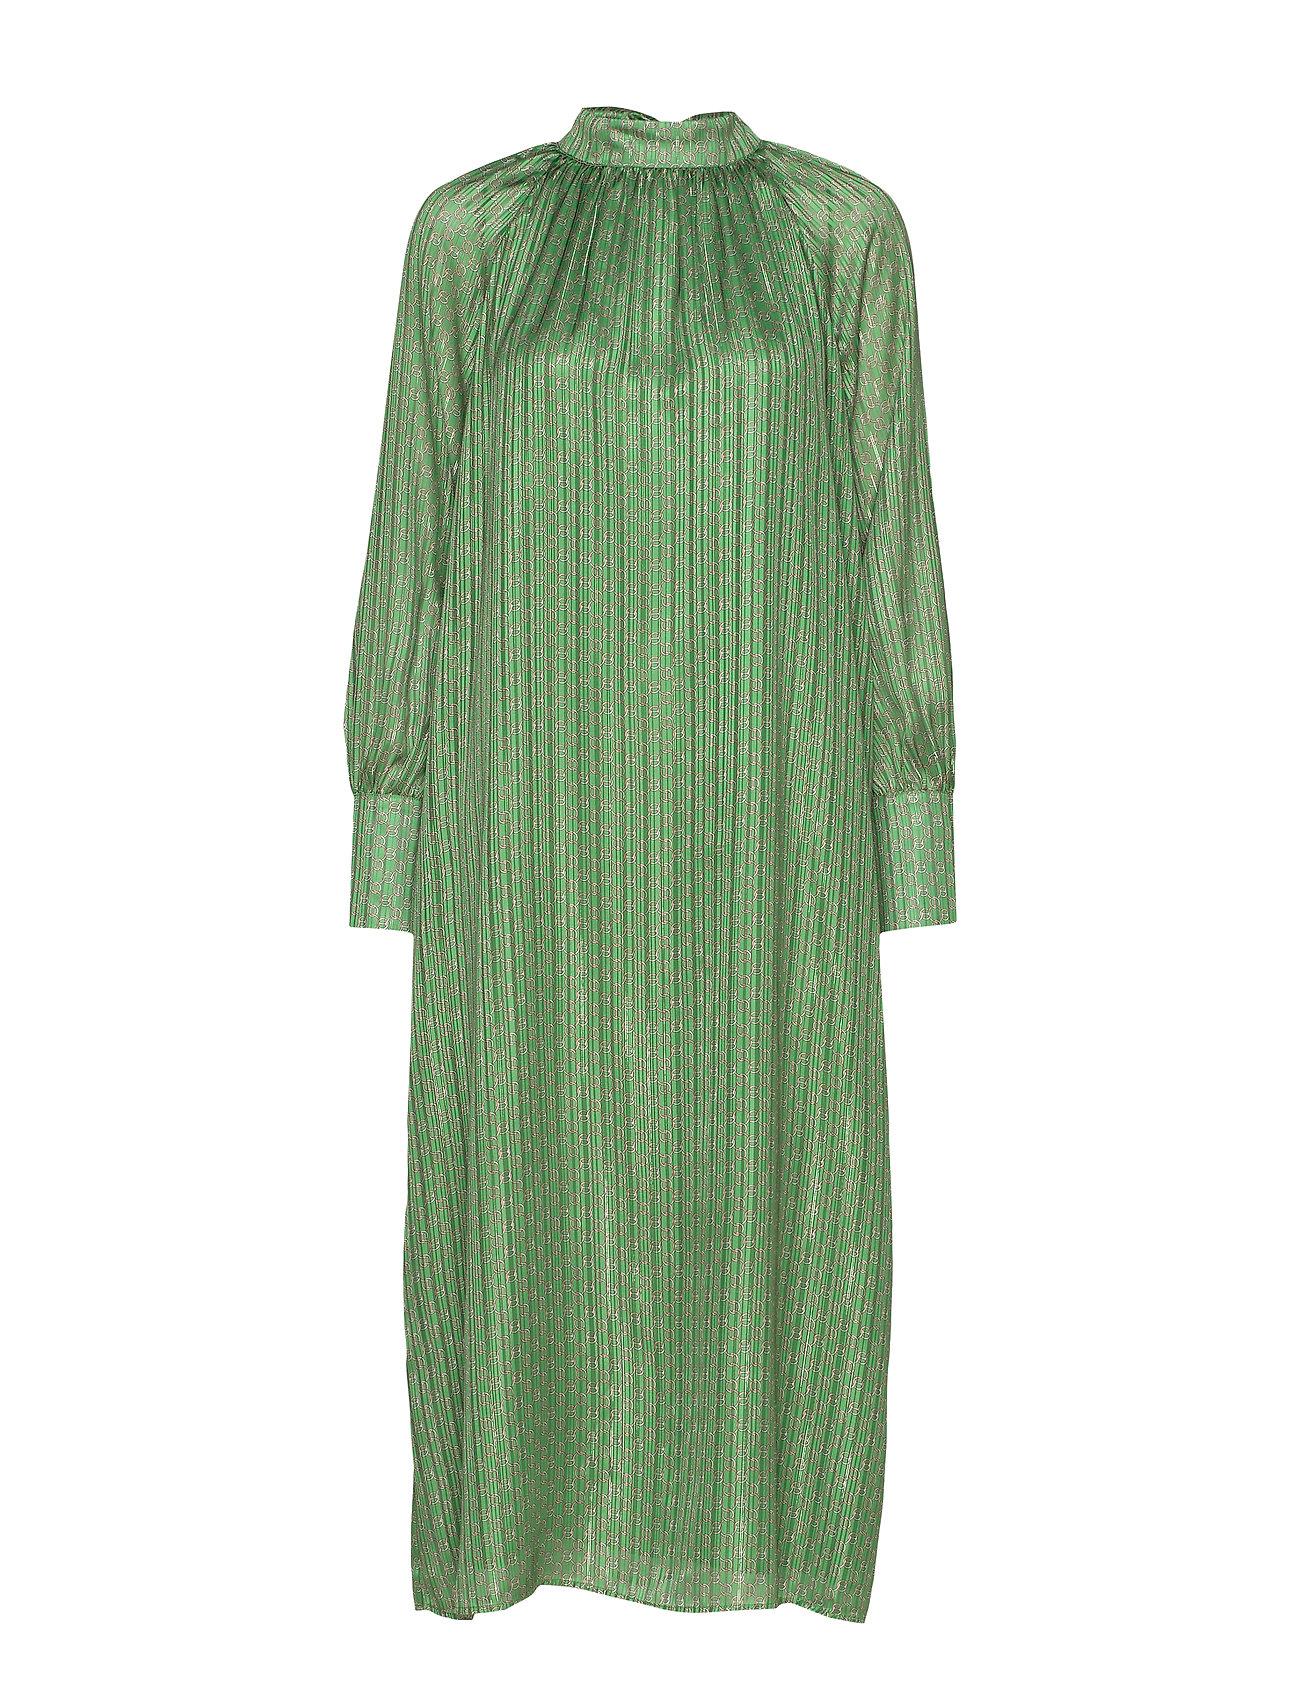 Birgitte Herskind Sussi Dress - CLASSY CHAIN